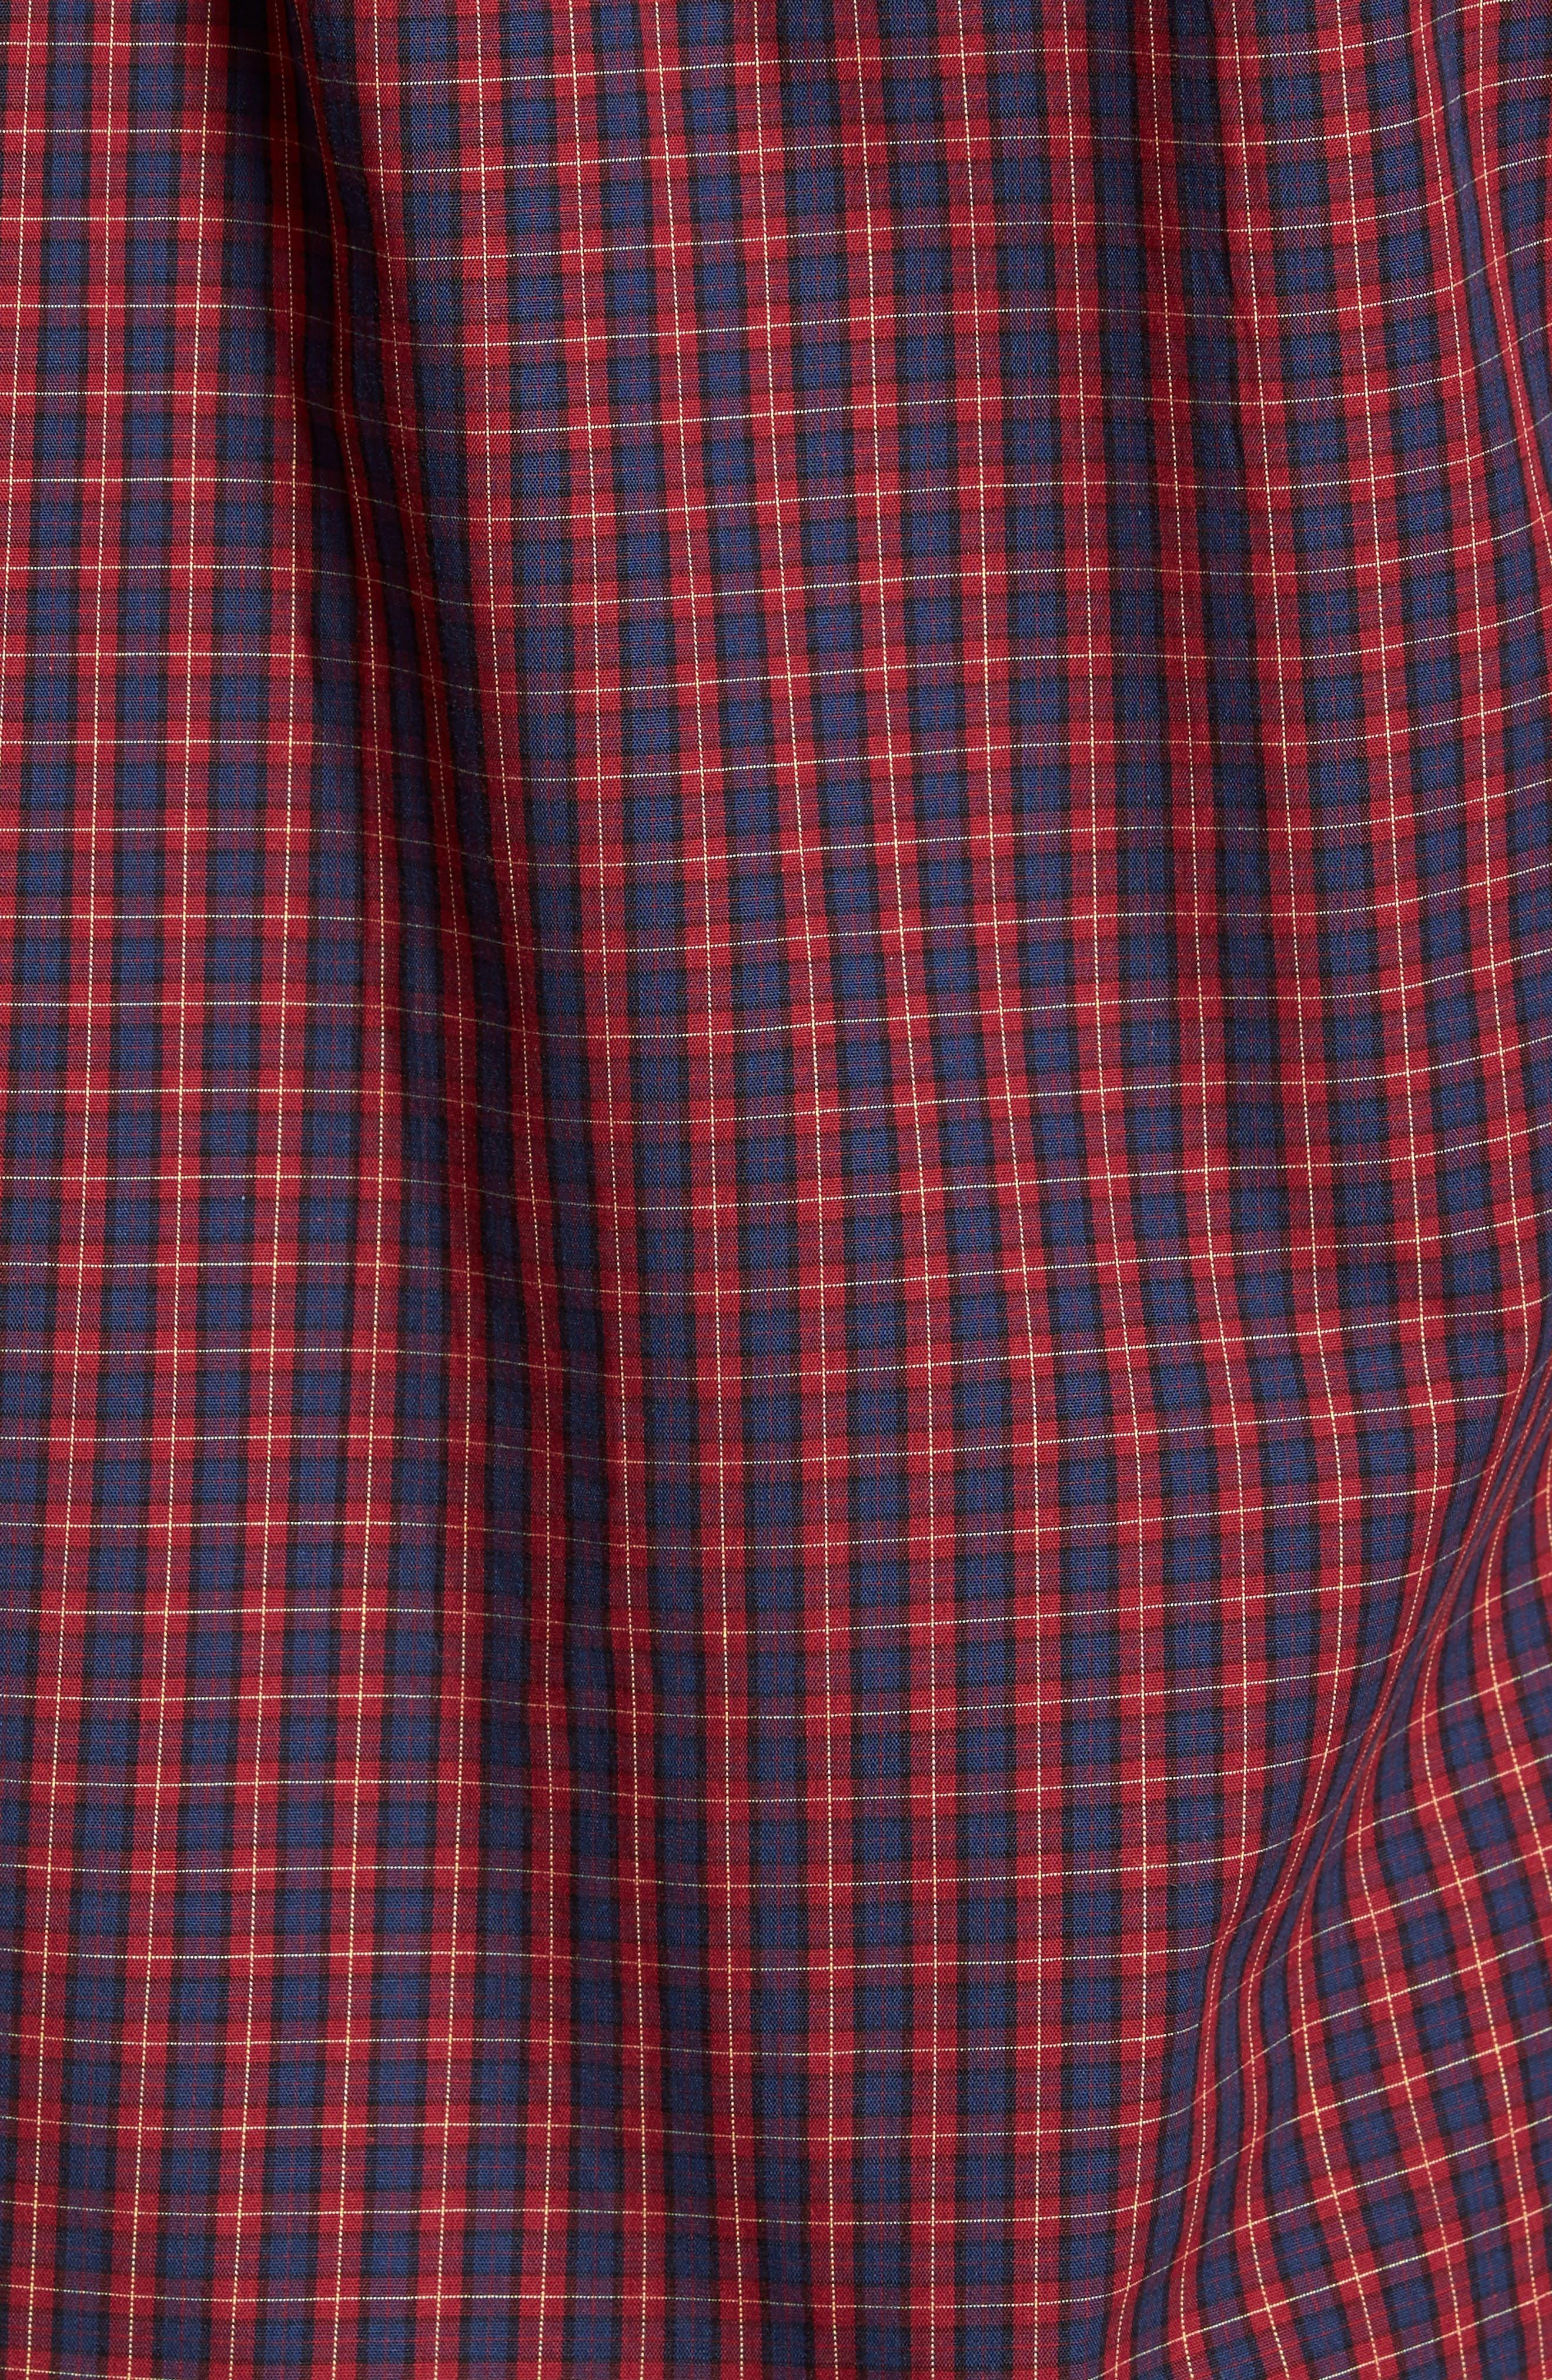 Tinto Plaid Woven Shirt,                             Alternate thumbnail 5, color,                             600